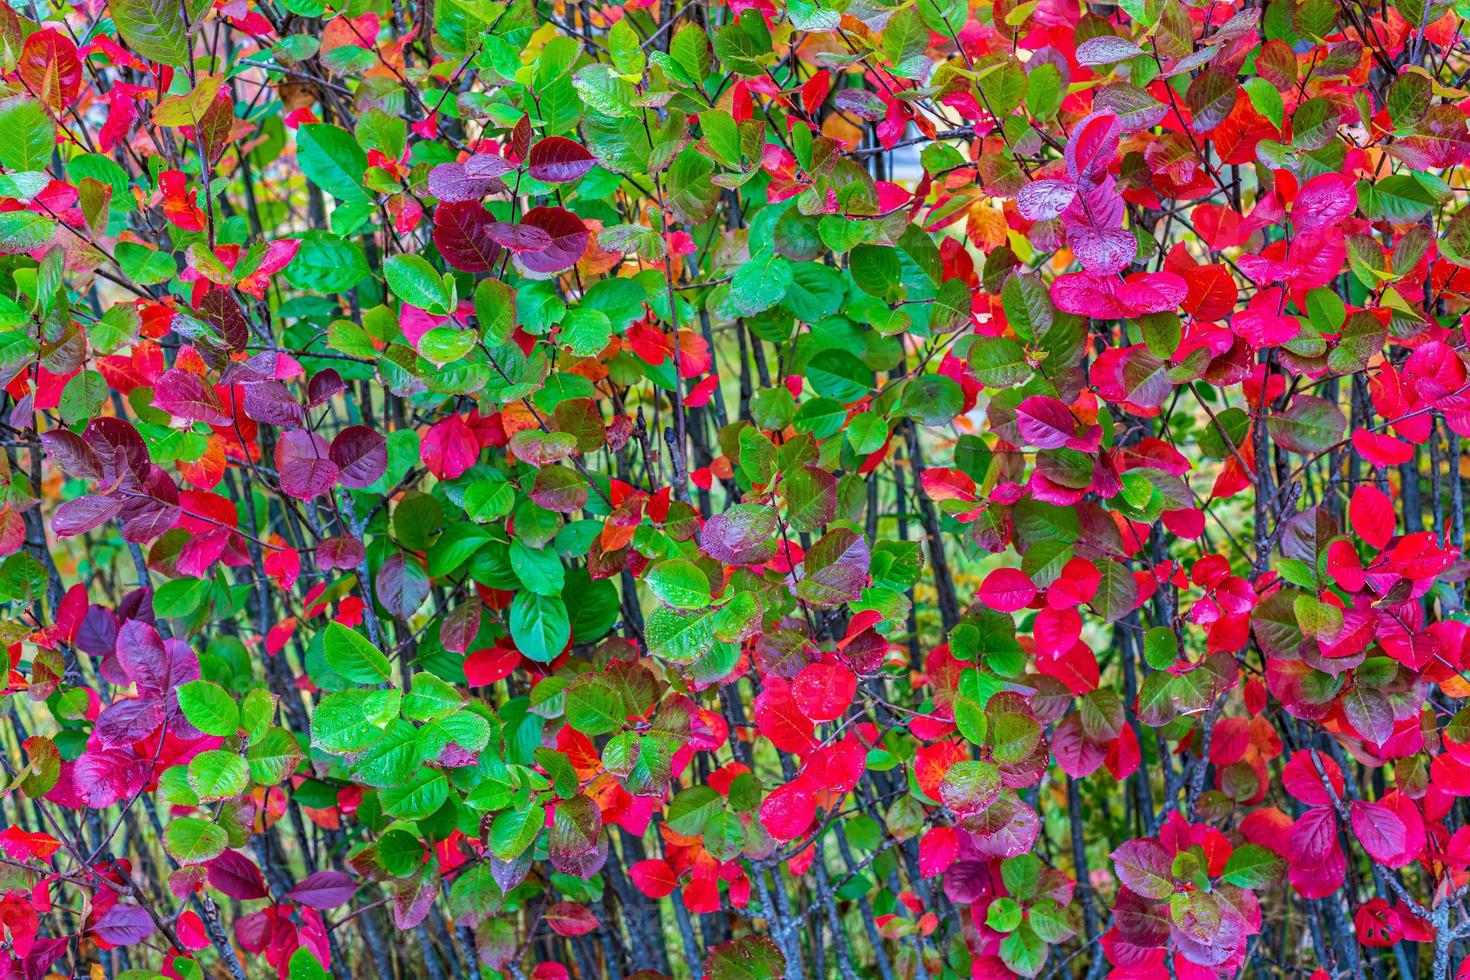 foglie colorate autunnali rosse e verdi foto